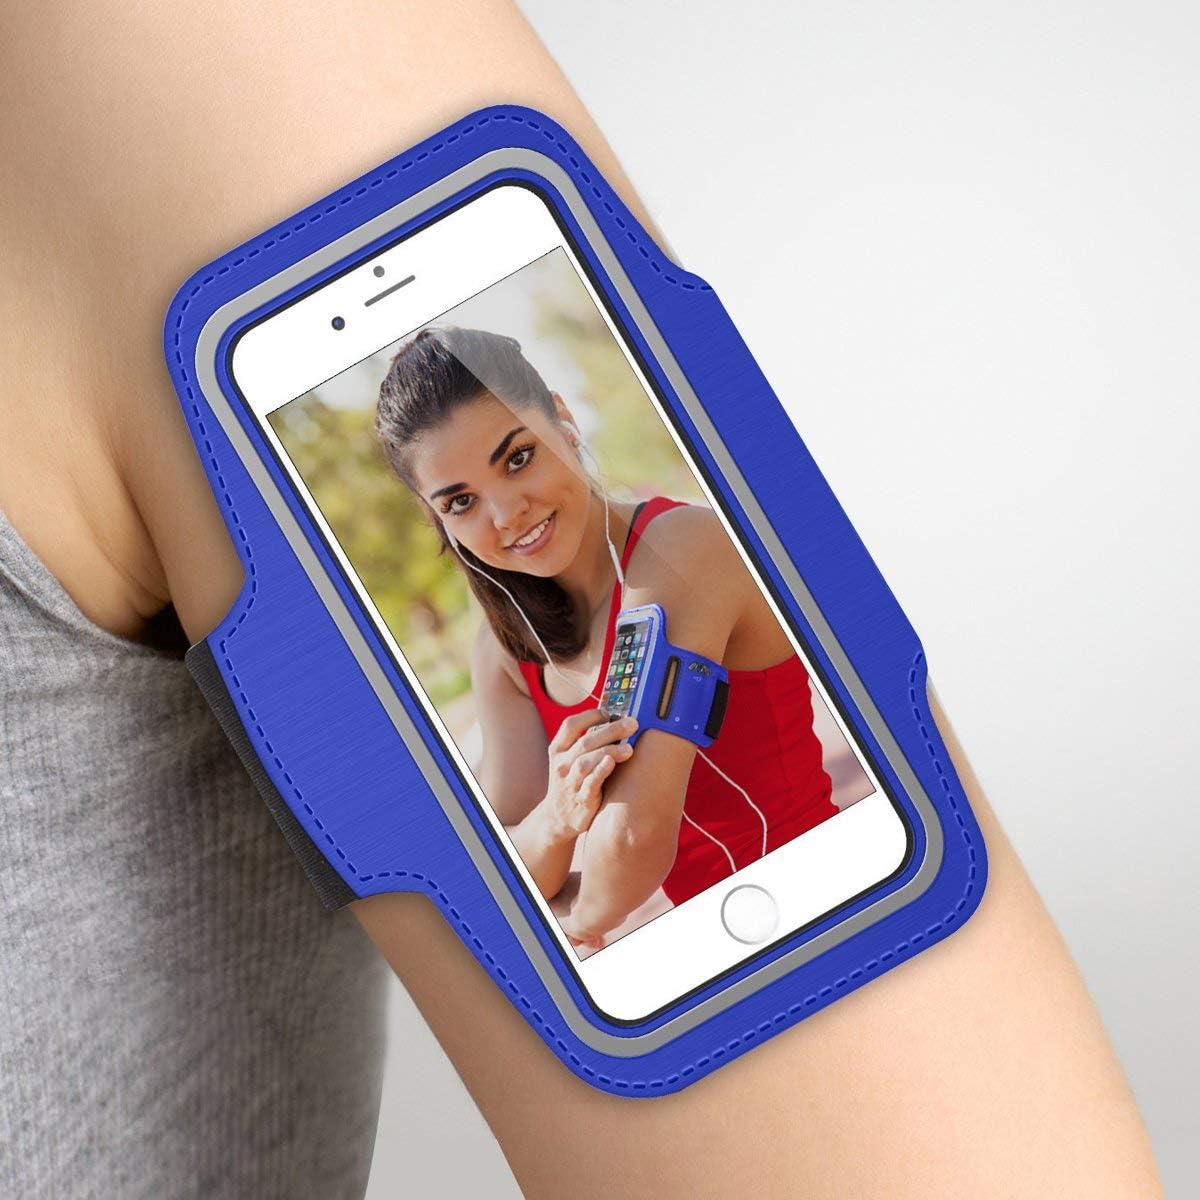 Azul Brazalete Deportivo iPhone X de Neopreno Antideslizante antisudor con Bolsillo para Llaves Cable Tarjetas Brazalete Running iPhone X Brazalete para iPhone X